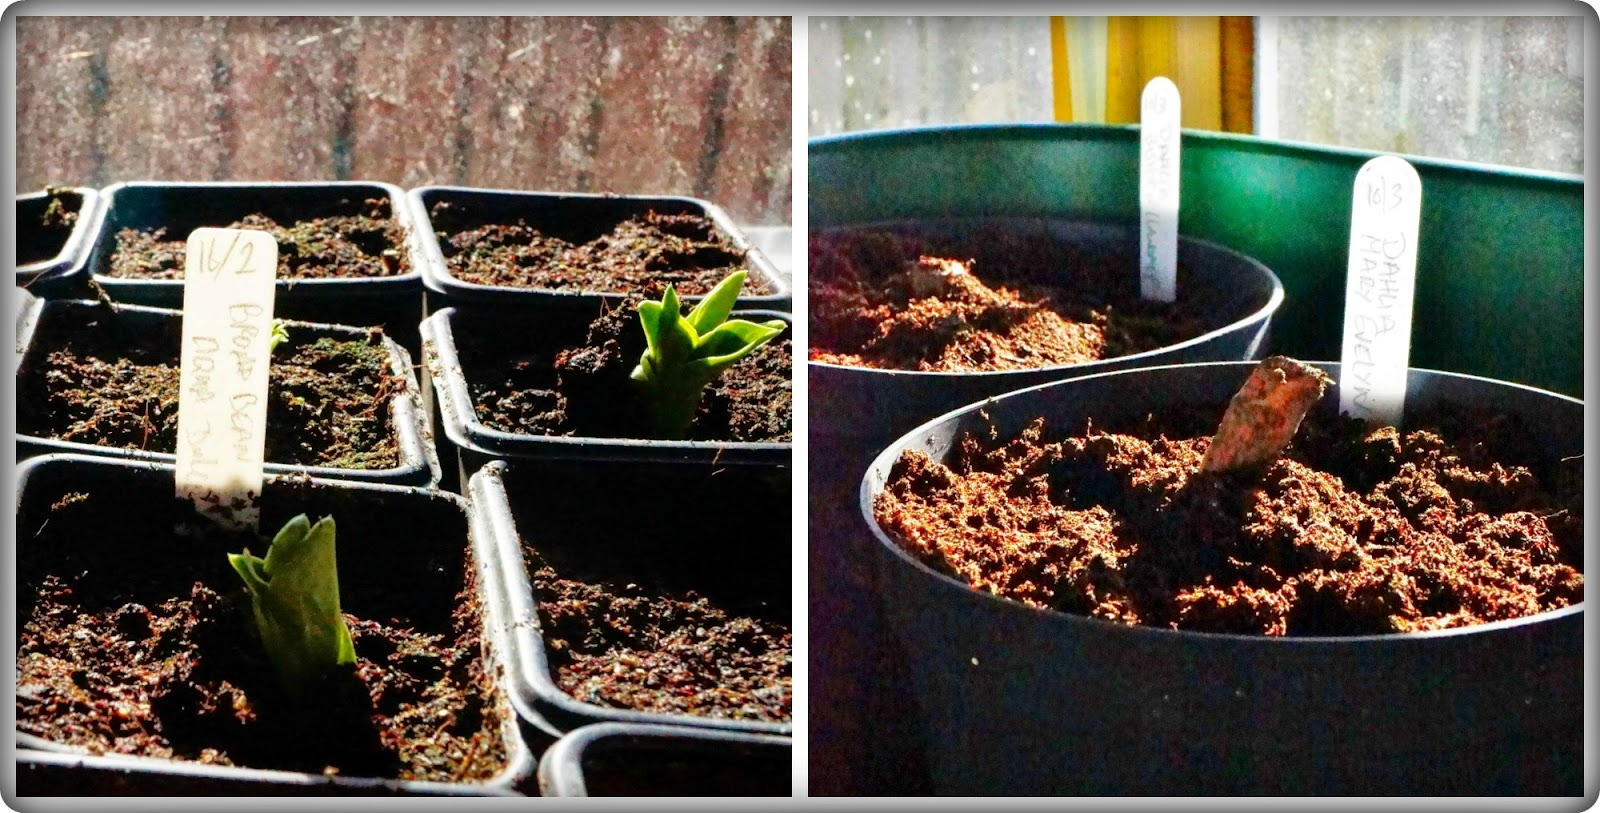 Broad beans and Dahlias -  'growourown.blogspot.com' ~ An allotment blog